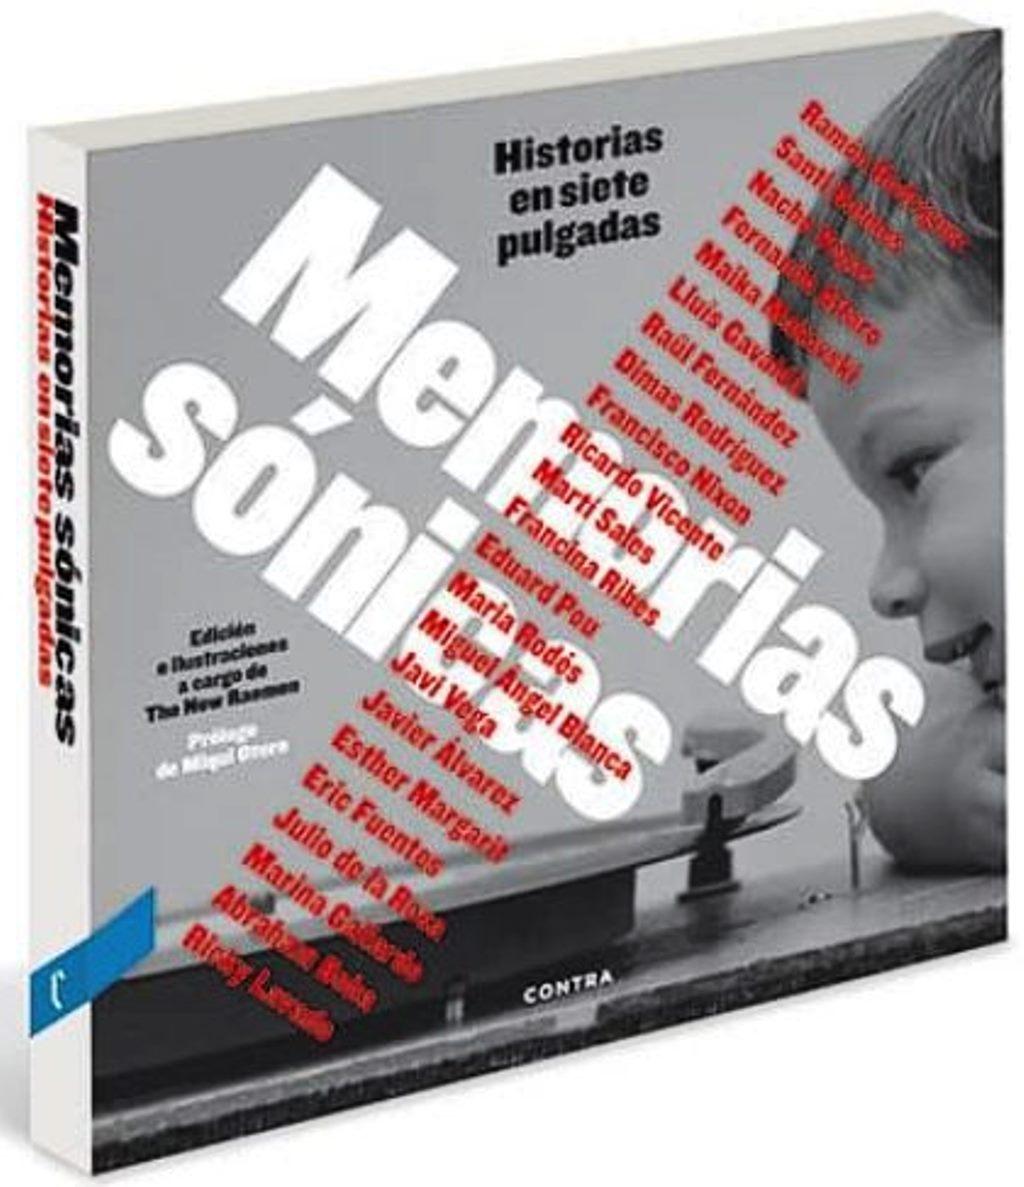 MEMORIAS SONICAS . HISTORIAS EN SIETE PULGADAS